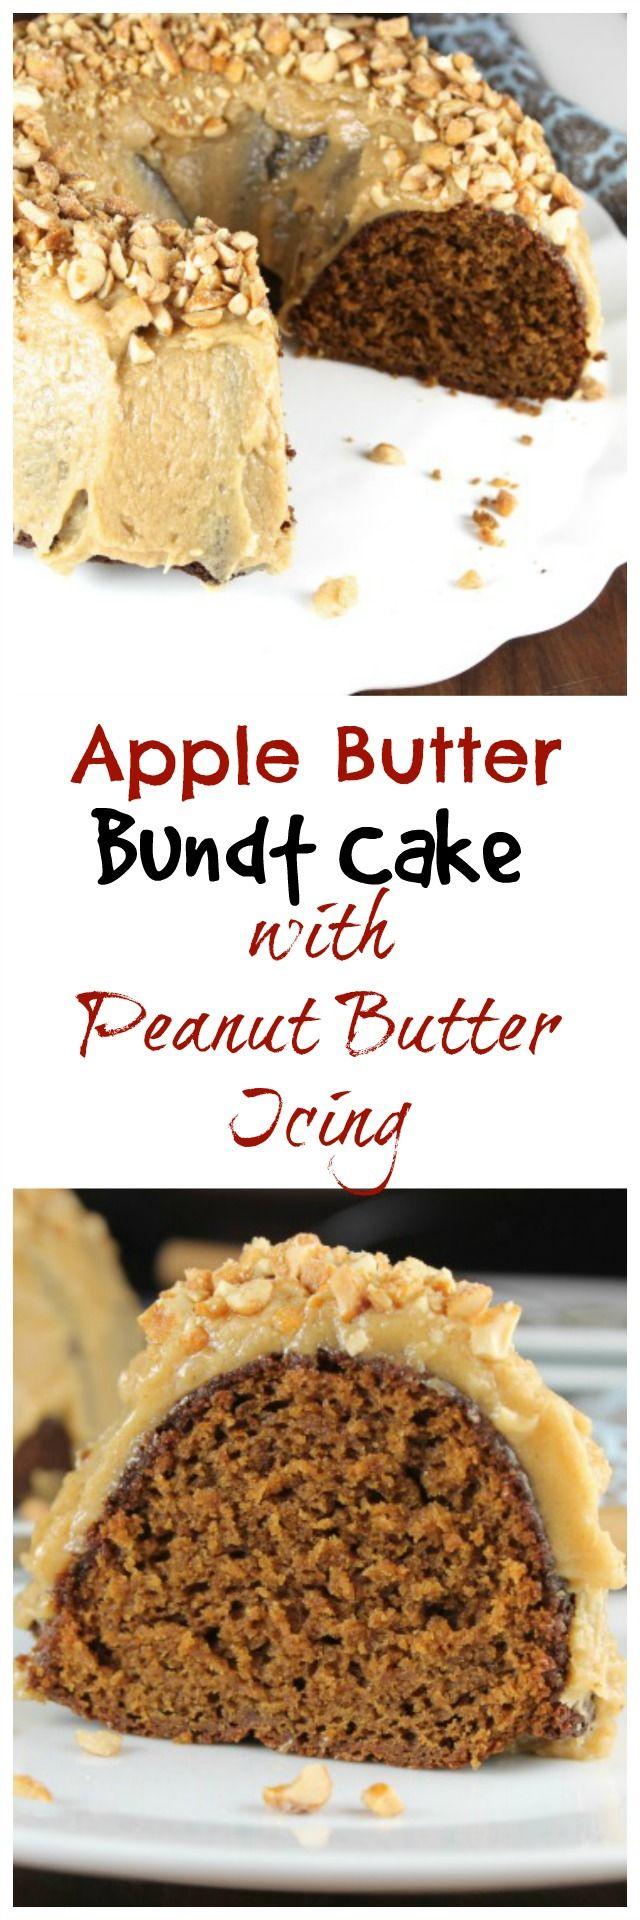 Apple Butter Bundt Cake With Peanut Butter Icing Recipe Best